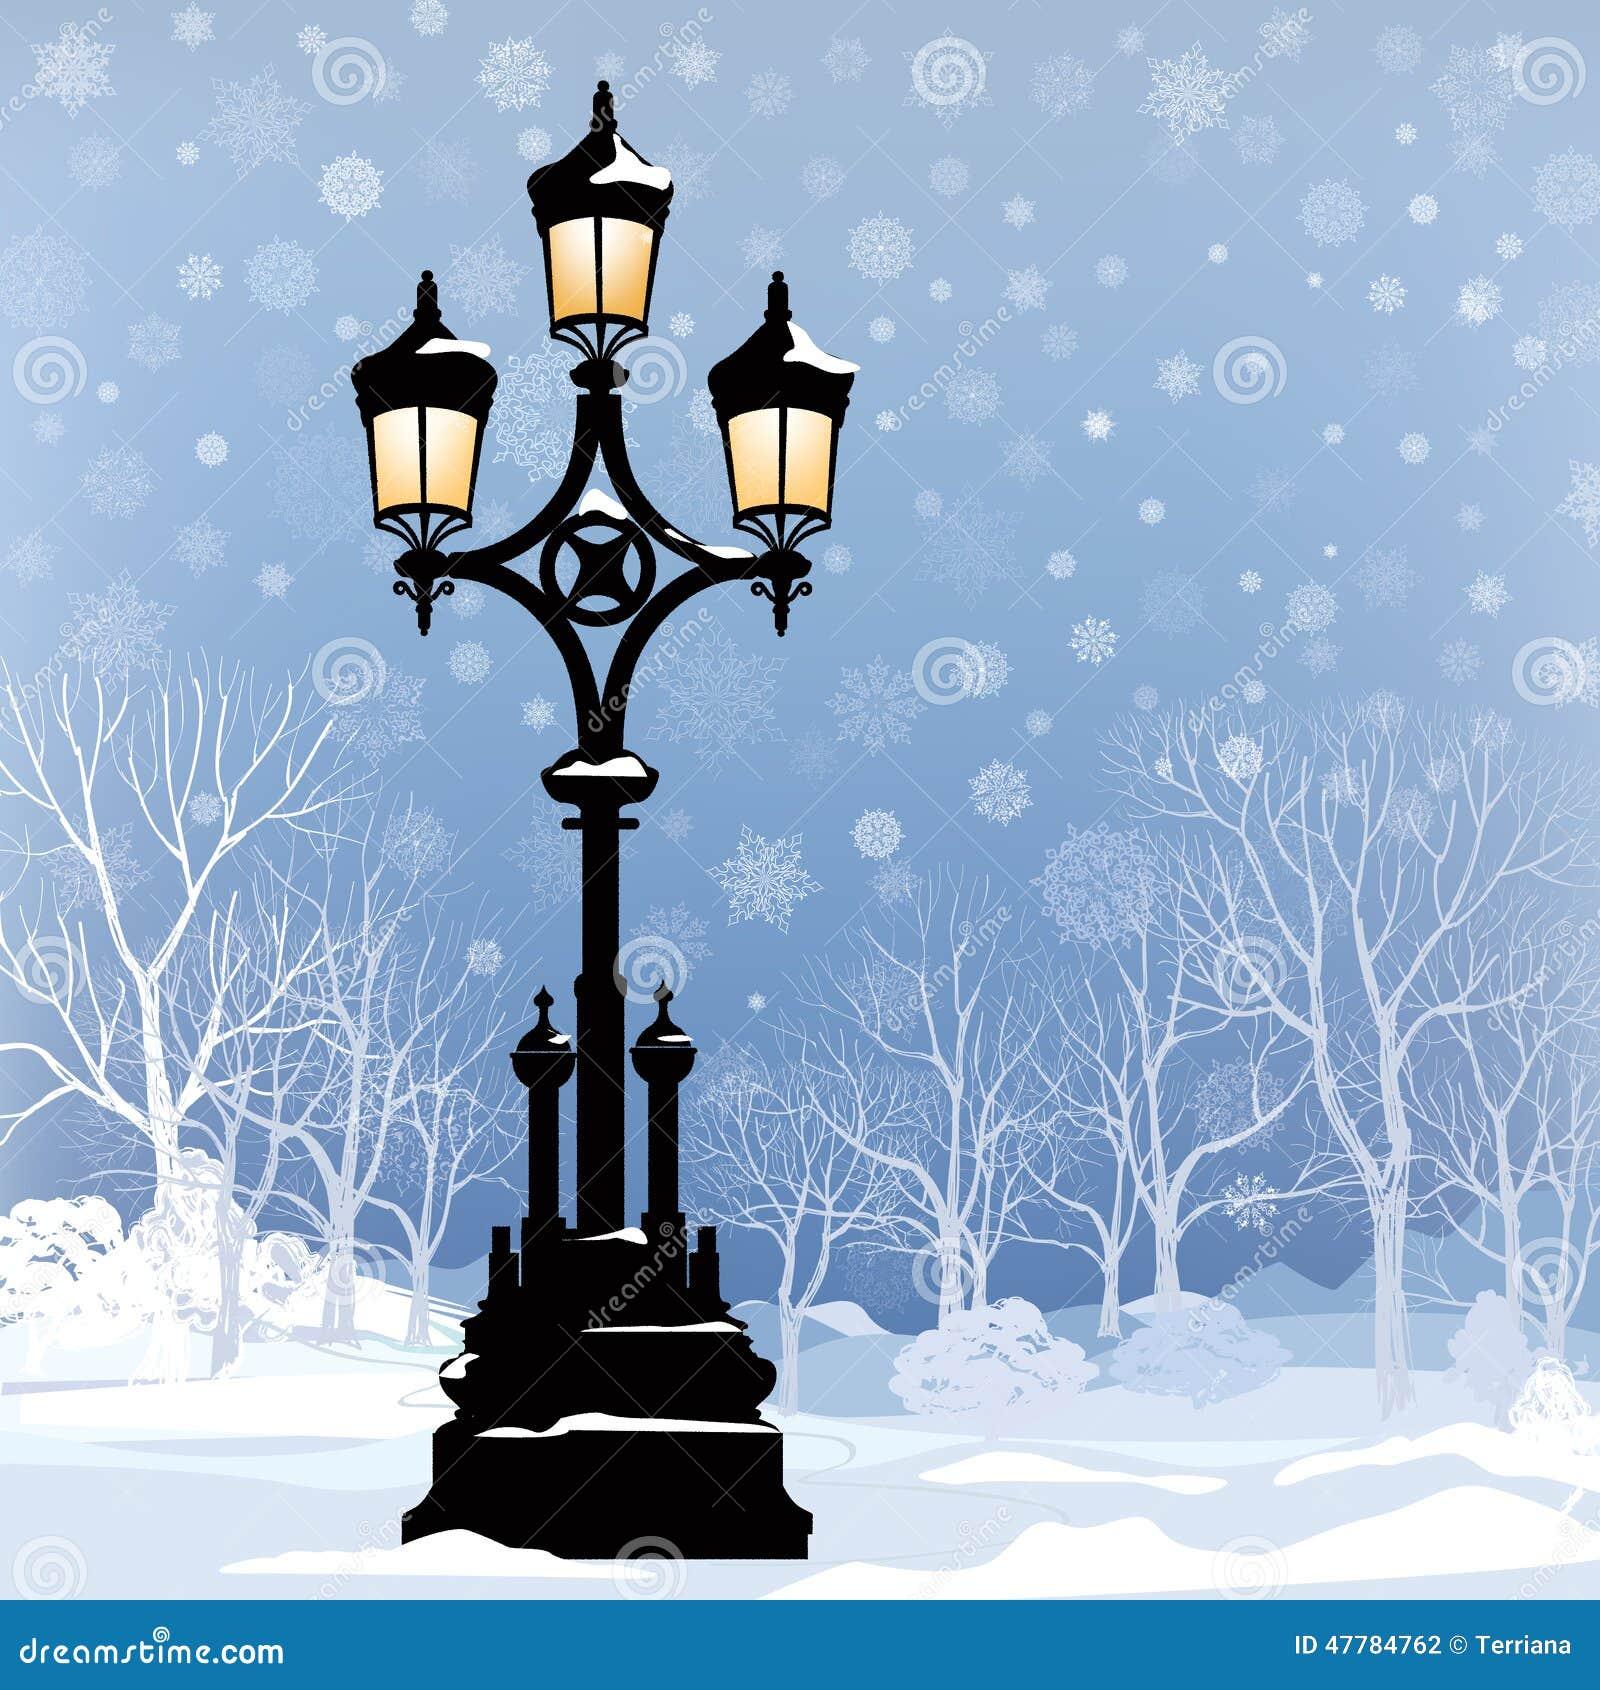 download christmas winter landscape with street light in park stock illustration illustration of exterior